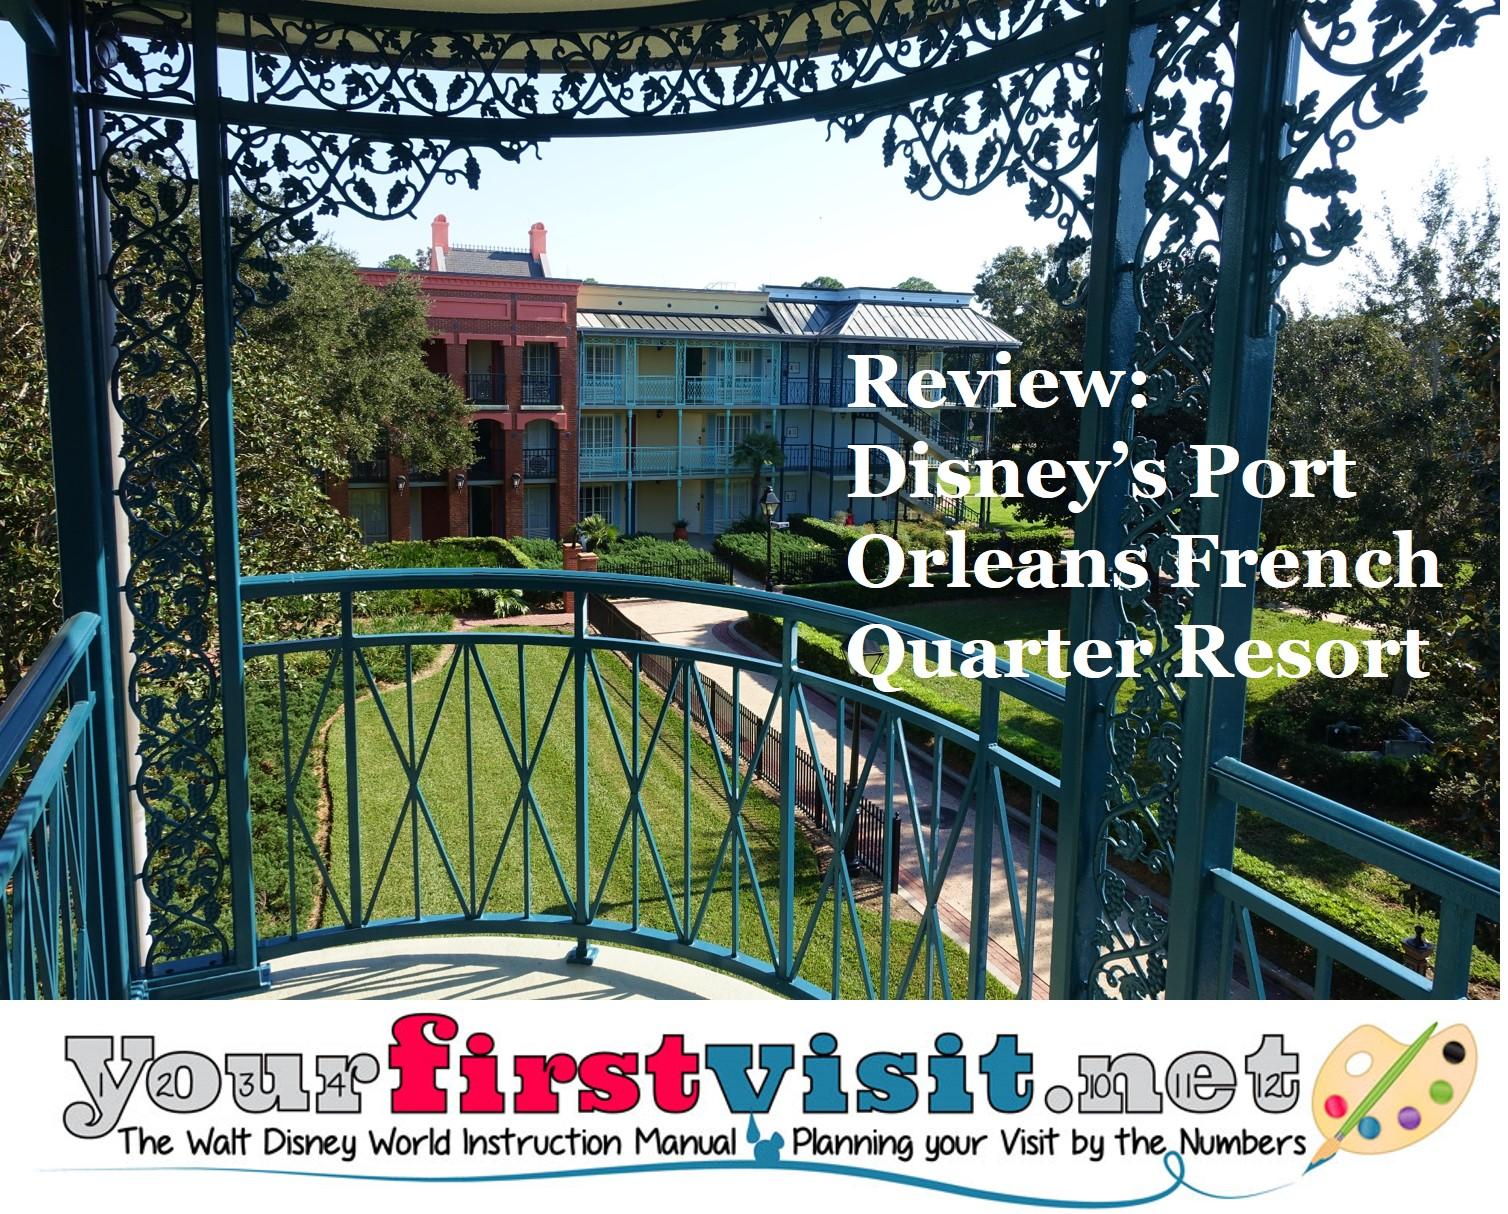 disneys-port-orleans-french-quarter-resort-from-yourfirstvisit-net